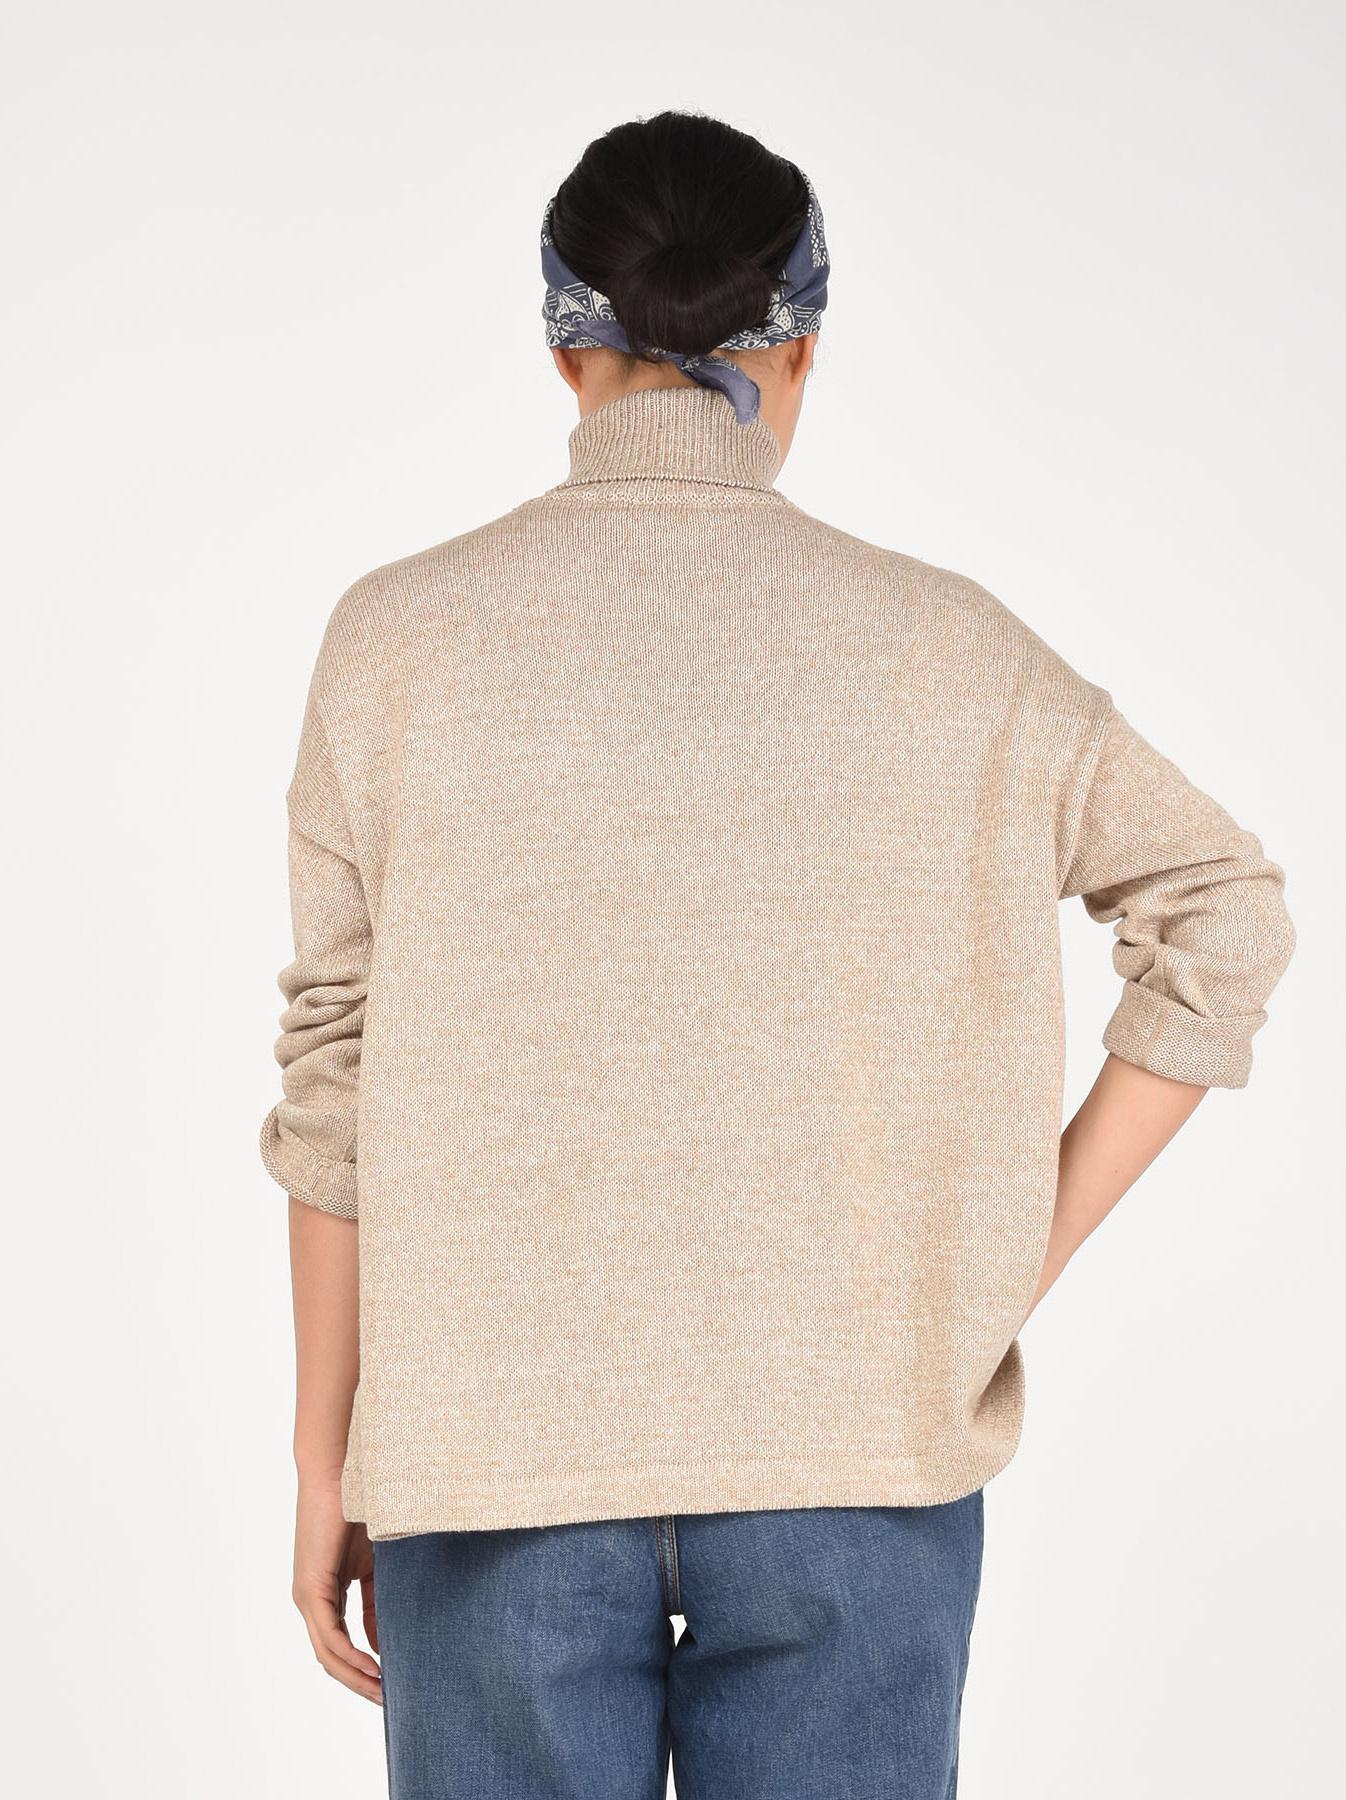 Zimbabwe Cotton Knit-sew Turtleneck-5